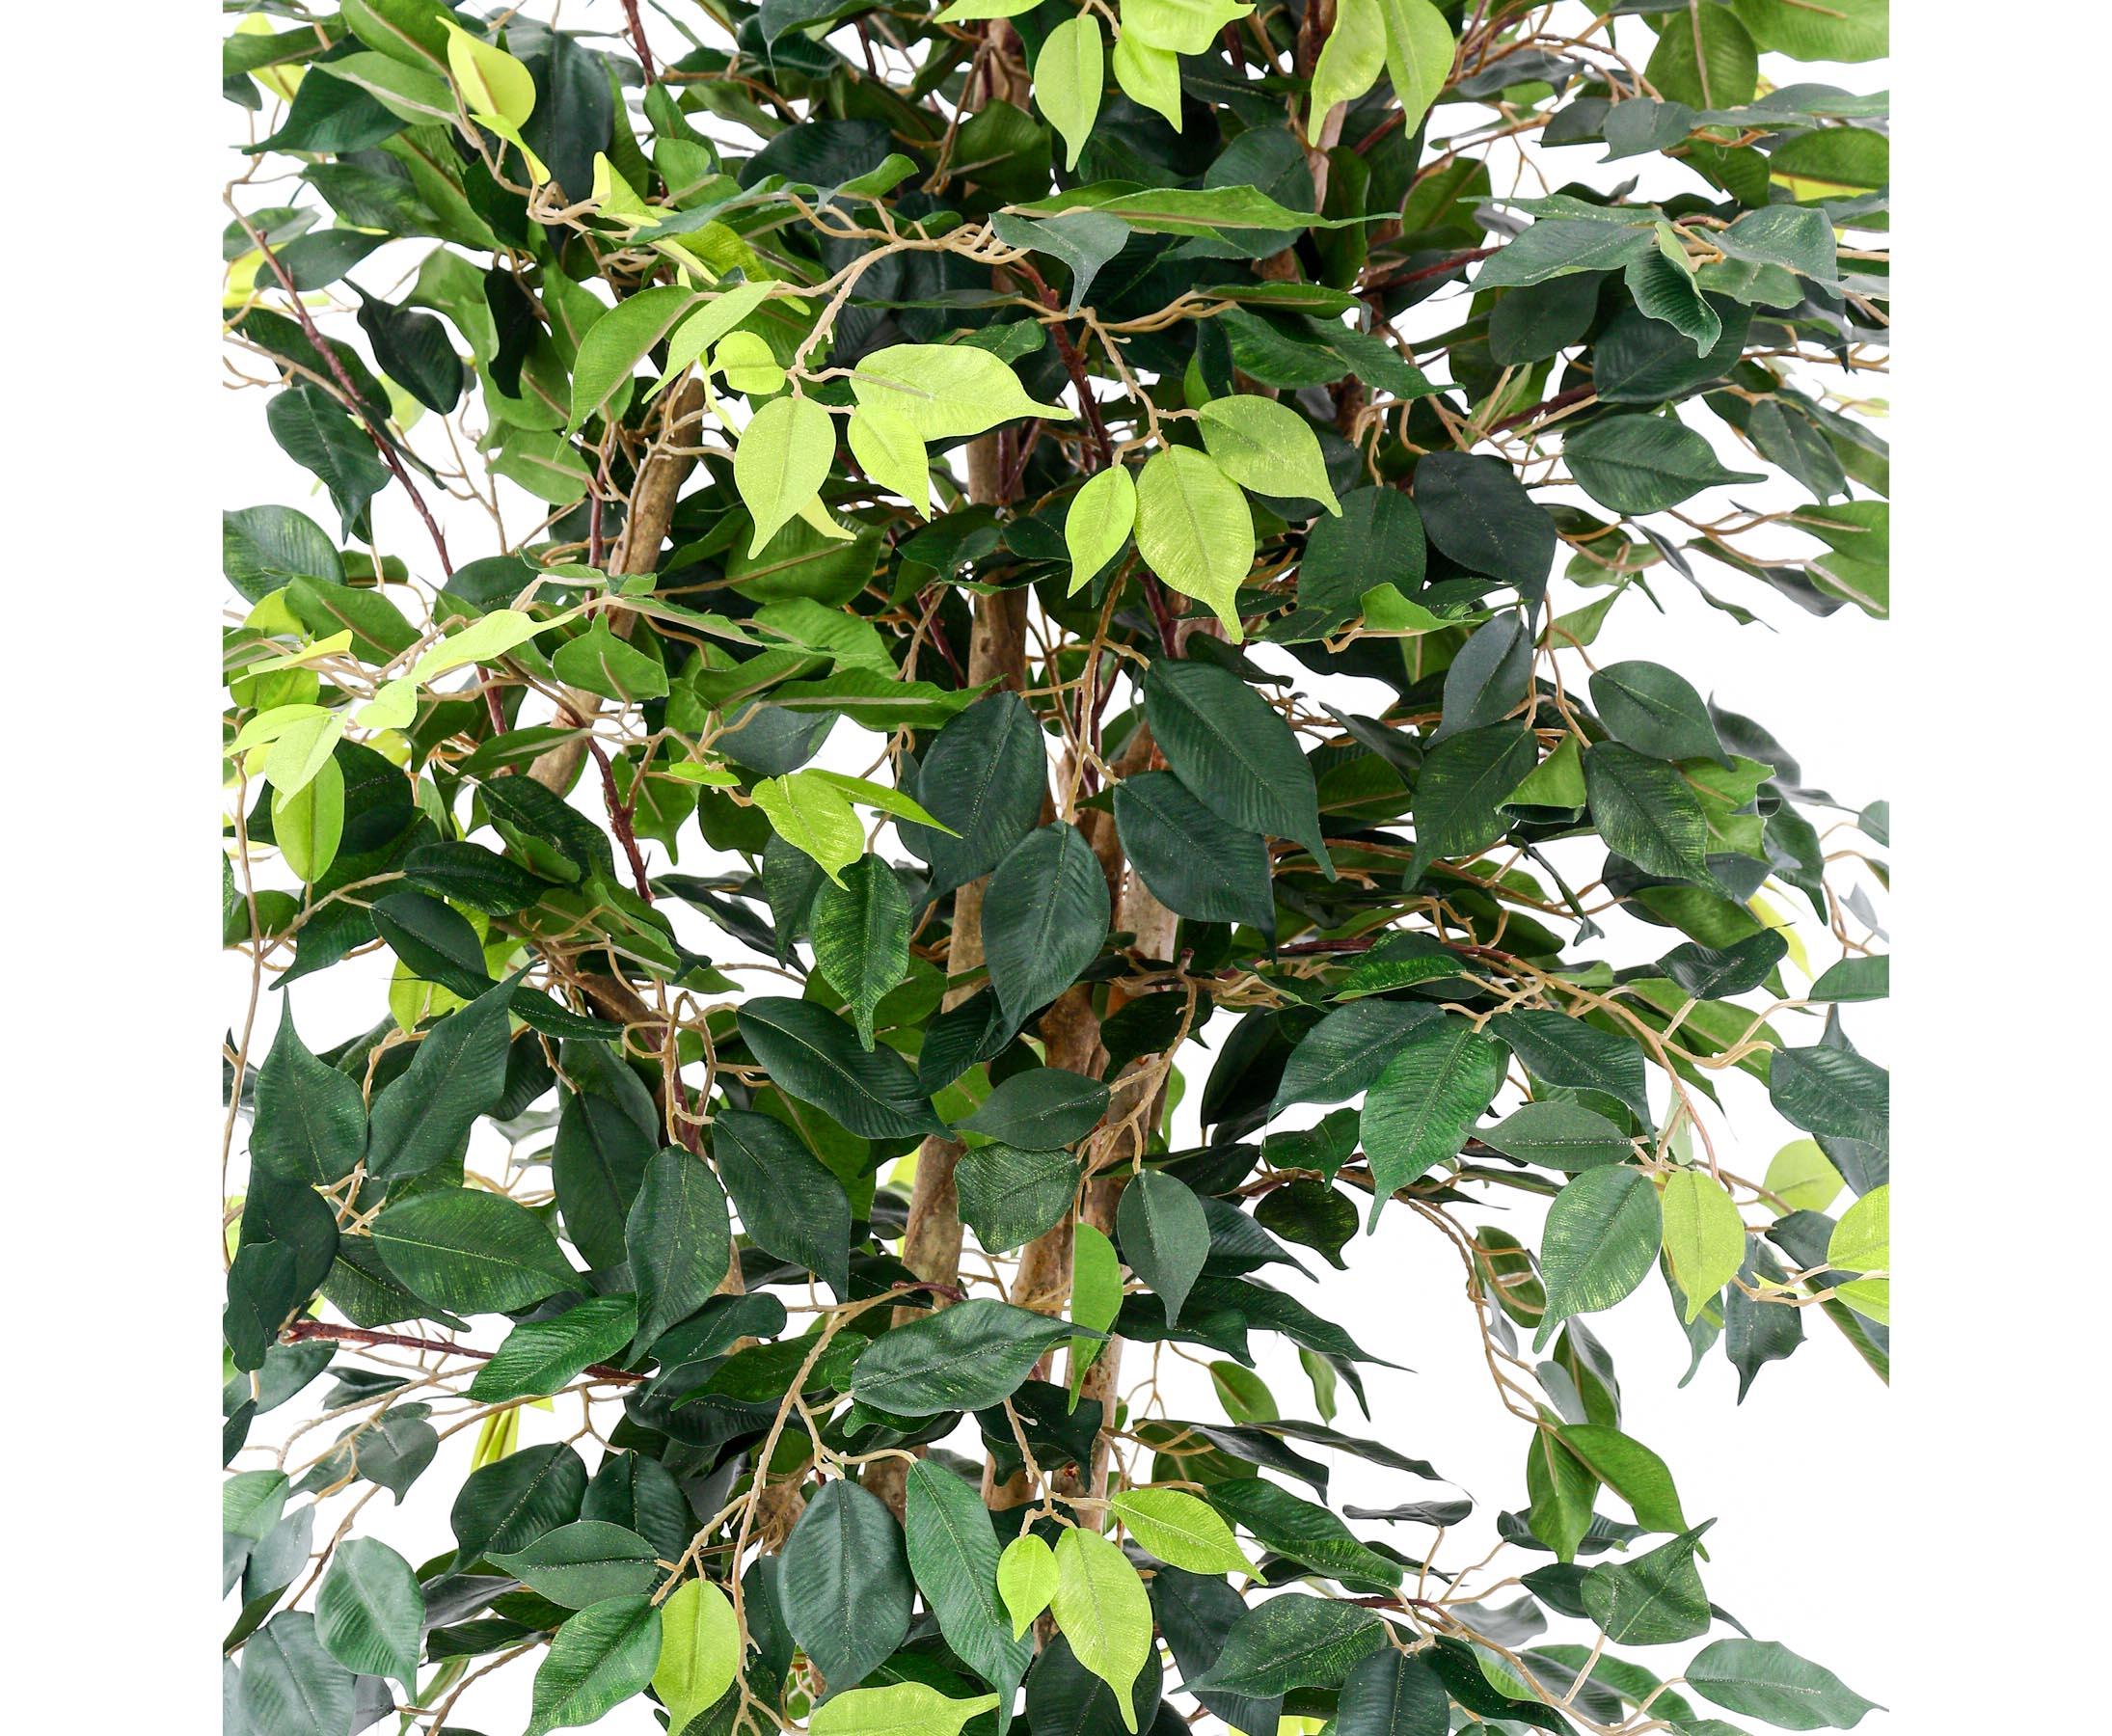 Kunstpflanze Dekobaum Kunstbaum Zitronenbaum 120 cm